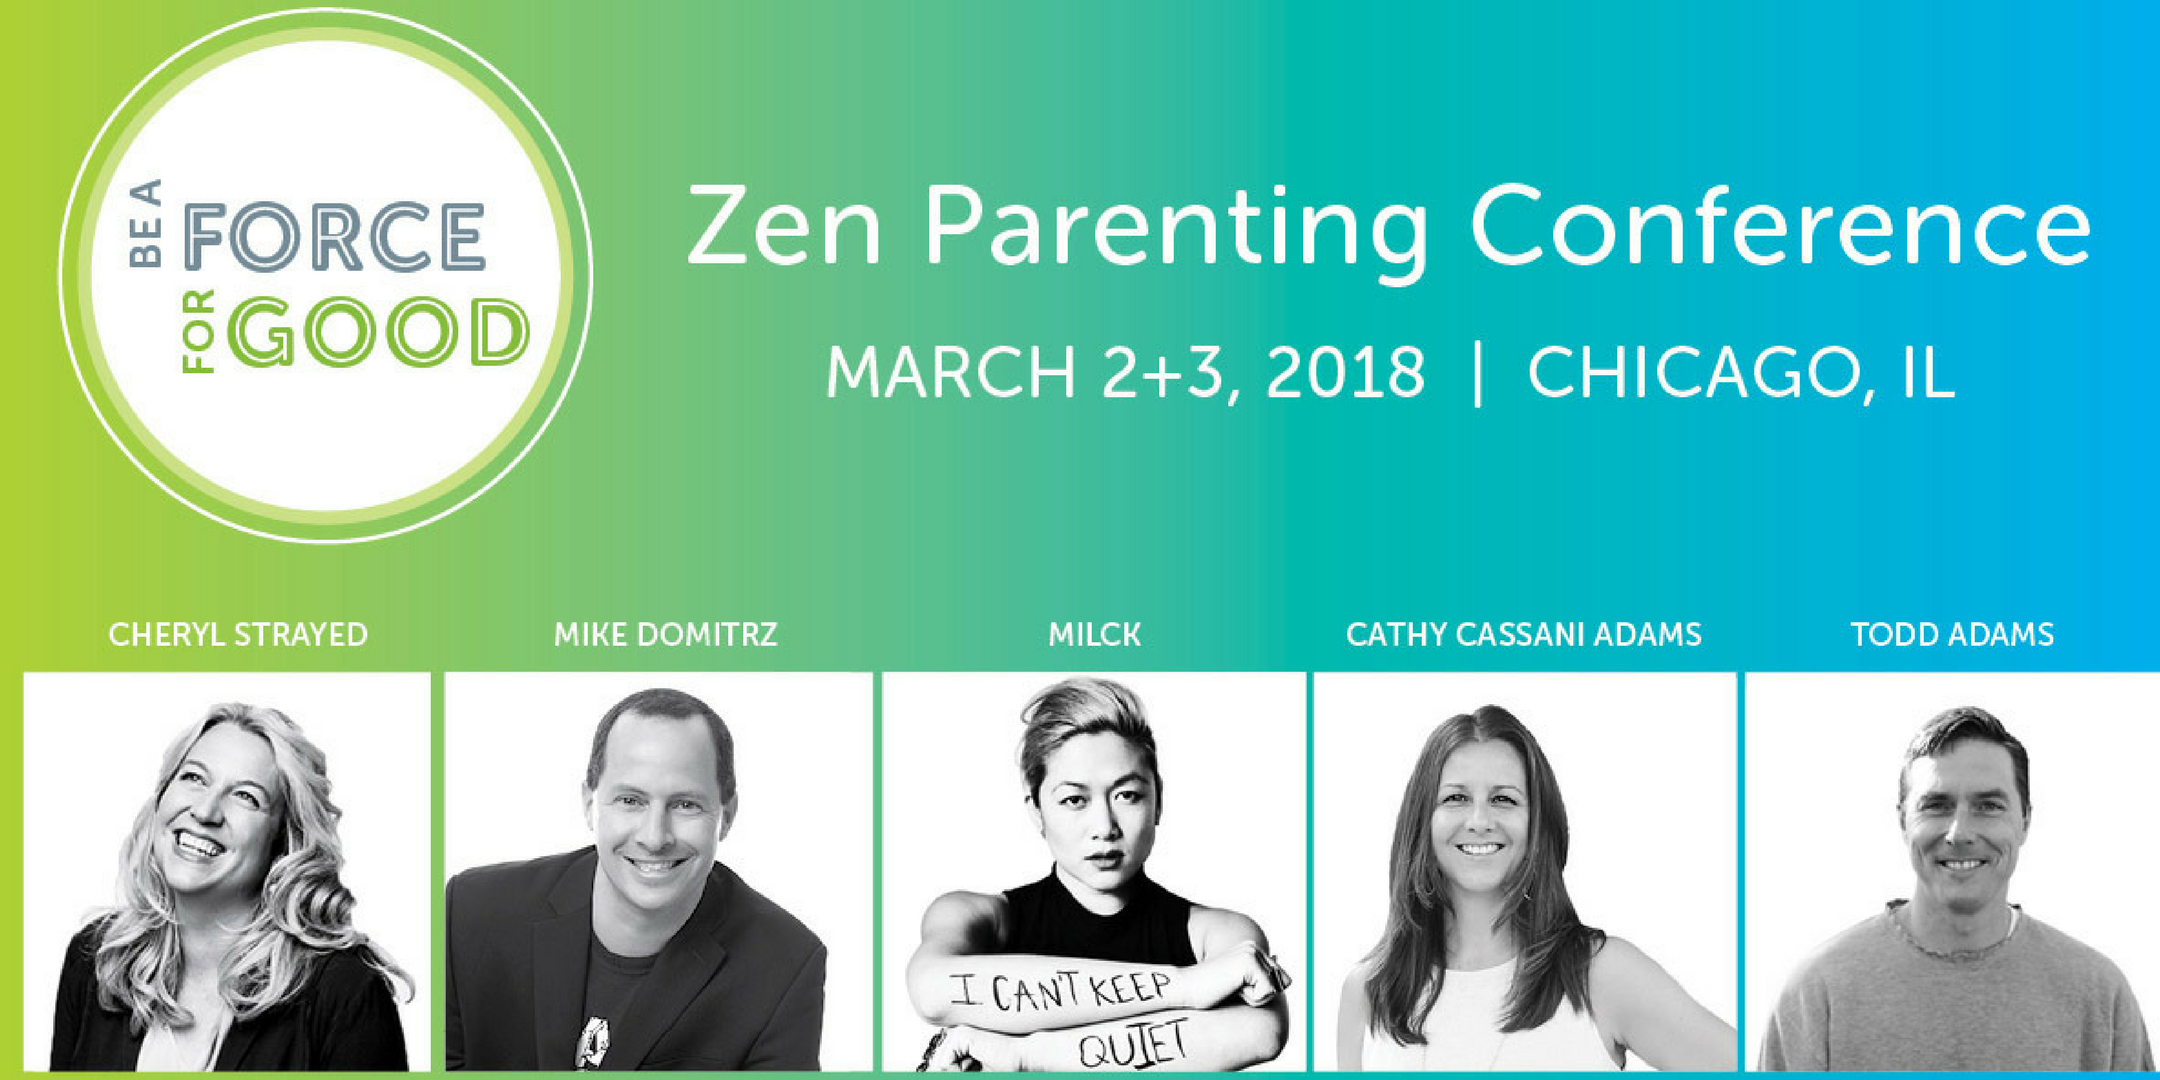 Zen Parenting Conference, 2018